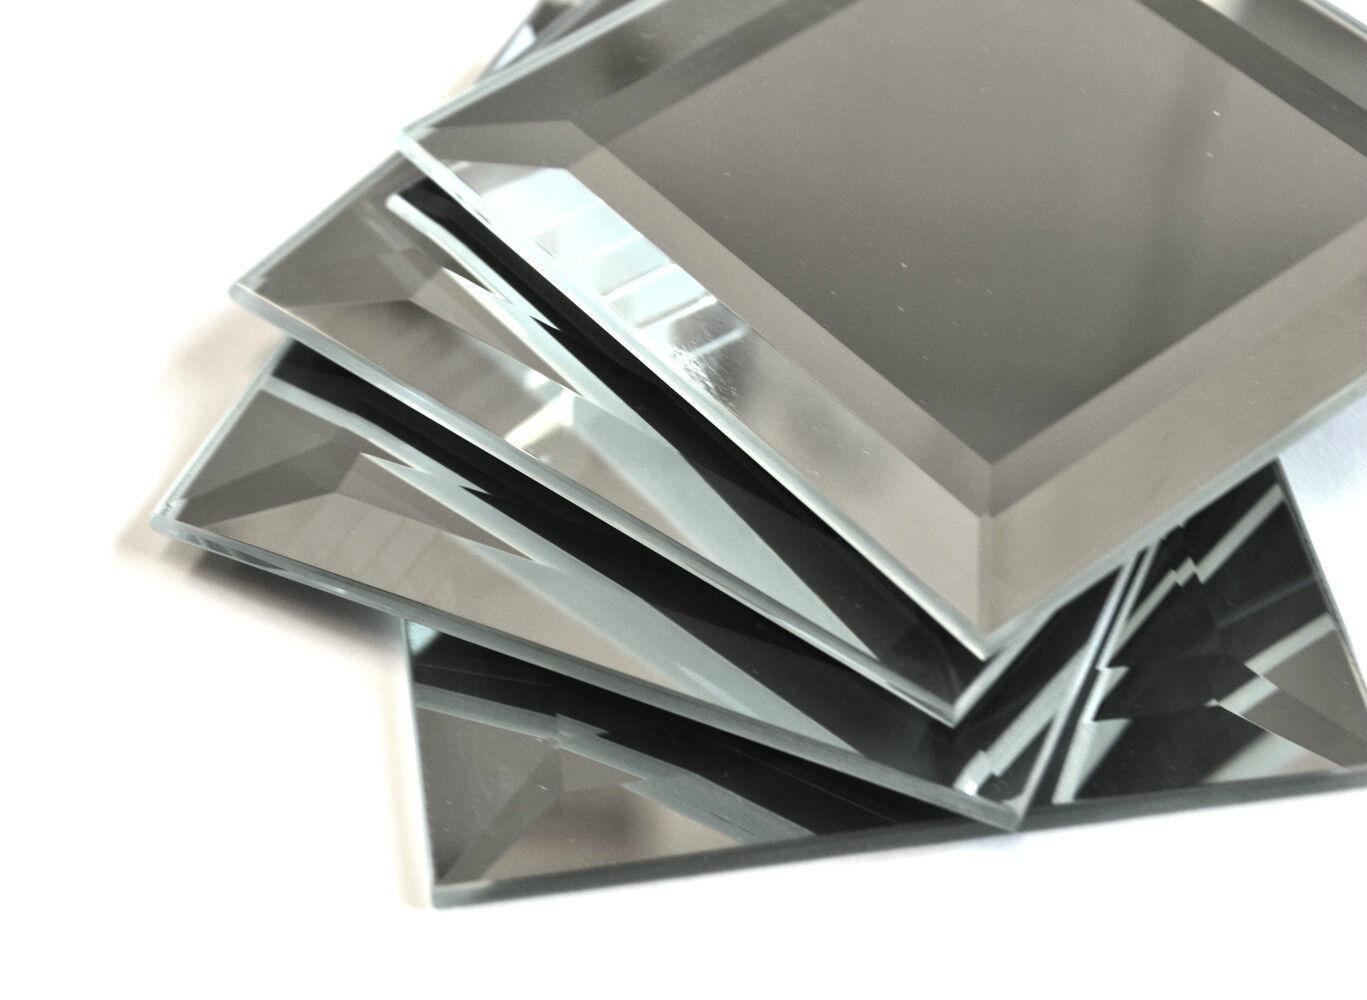 3x3 Wide Beveled Glass Mirror Tile Decorative Accent Art-cra